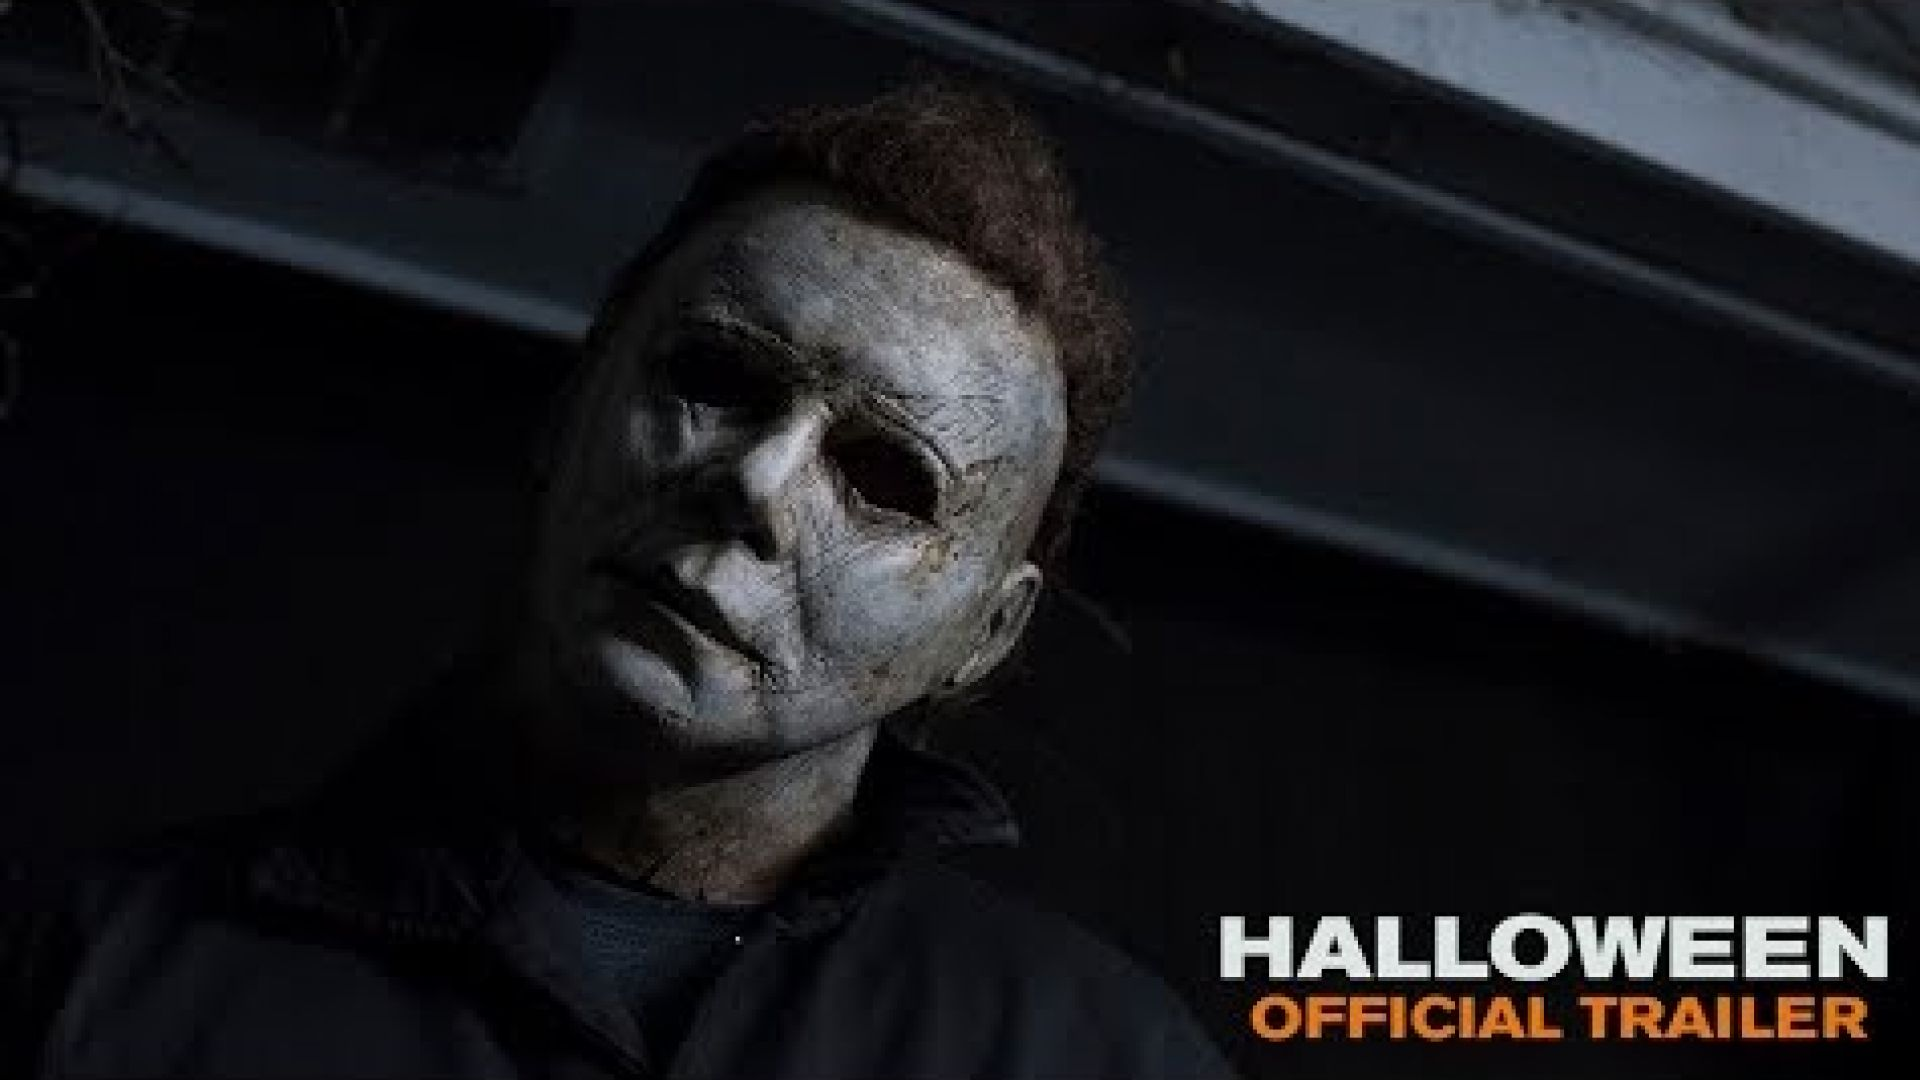 Halloween Trailer #2